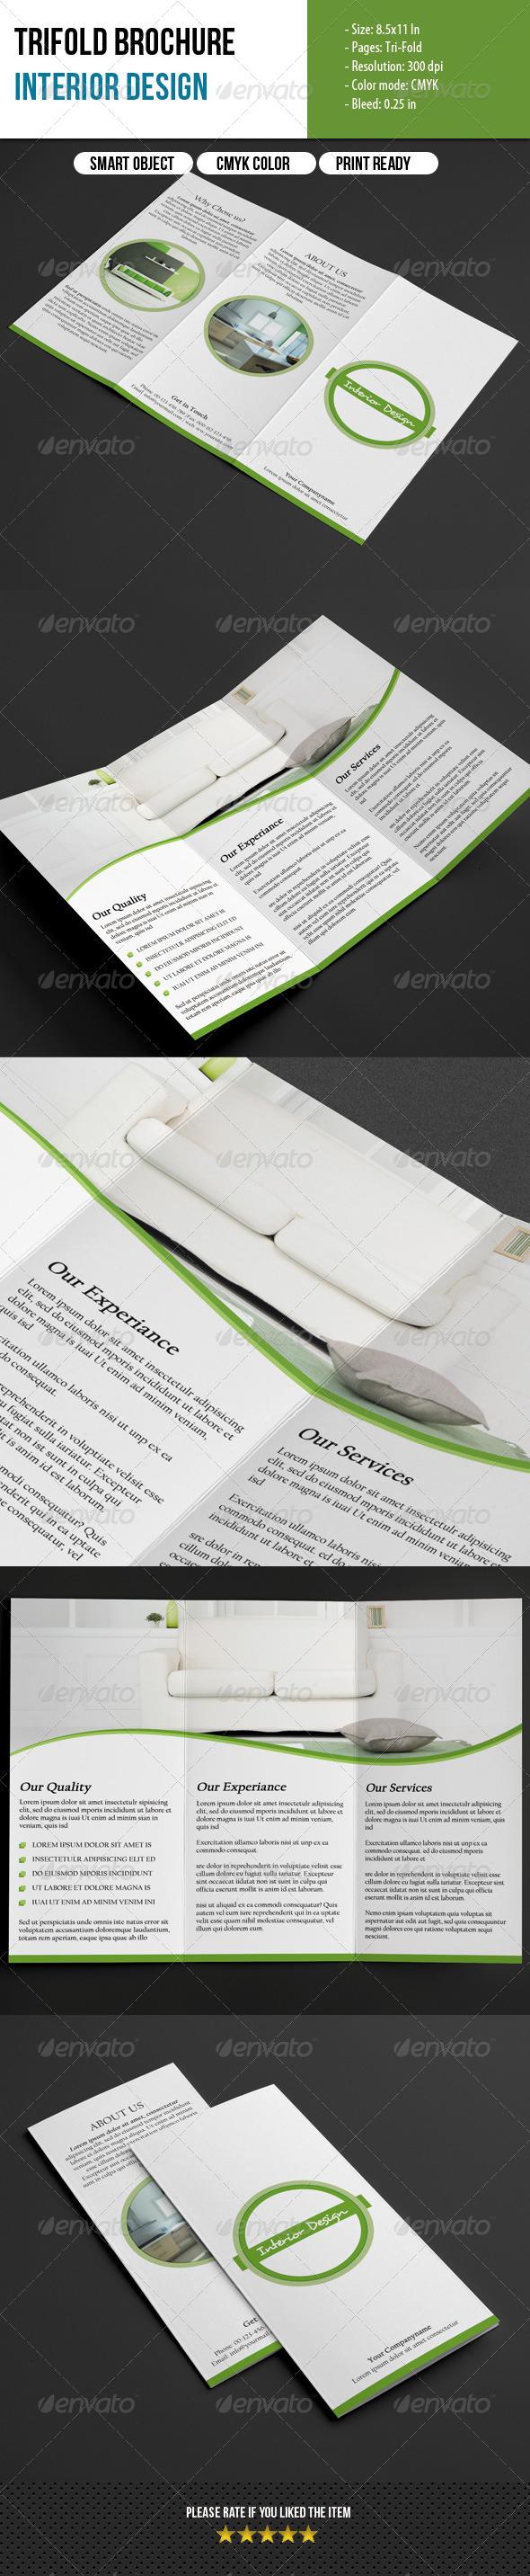 Trifold Brochure-Interior Design - Corporate Brochures